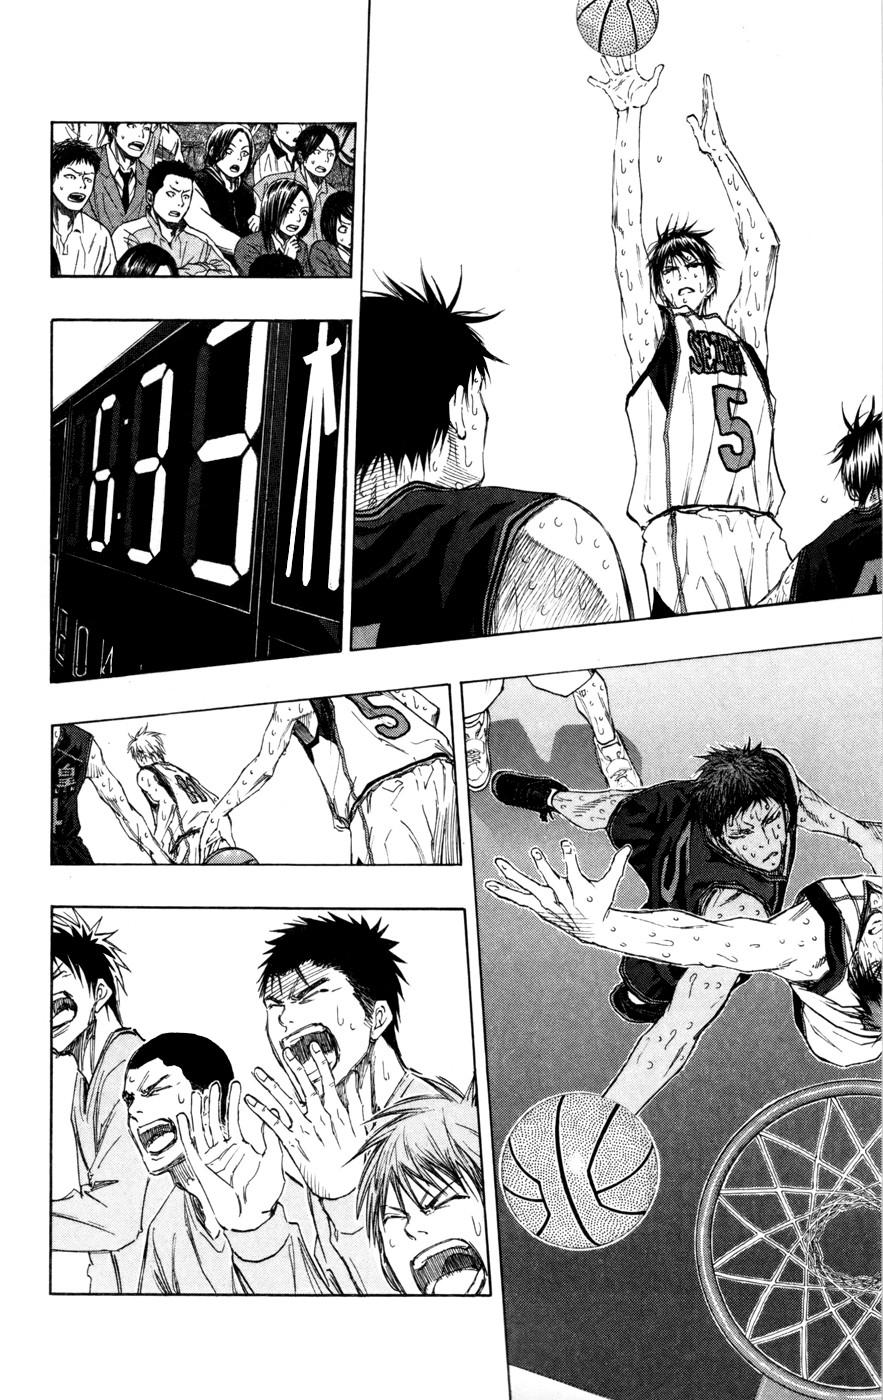 Kuroko no Basket Manga Chapter 131 - Image 15